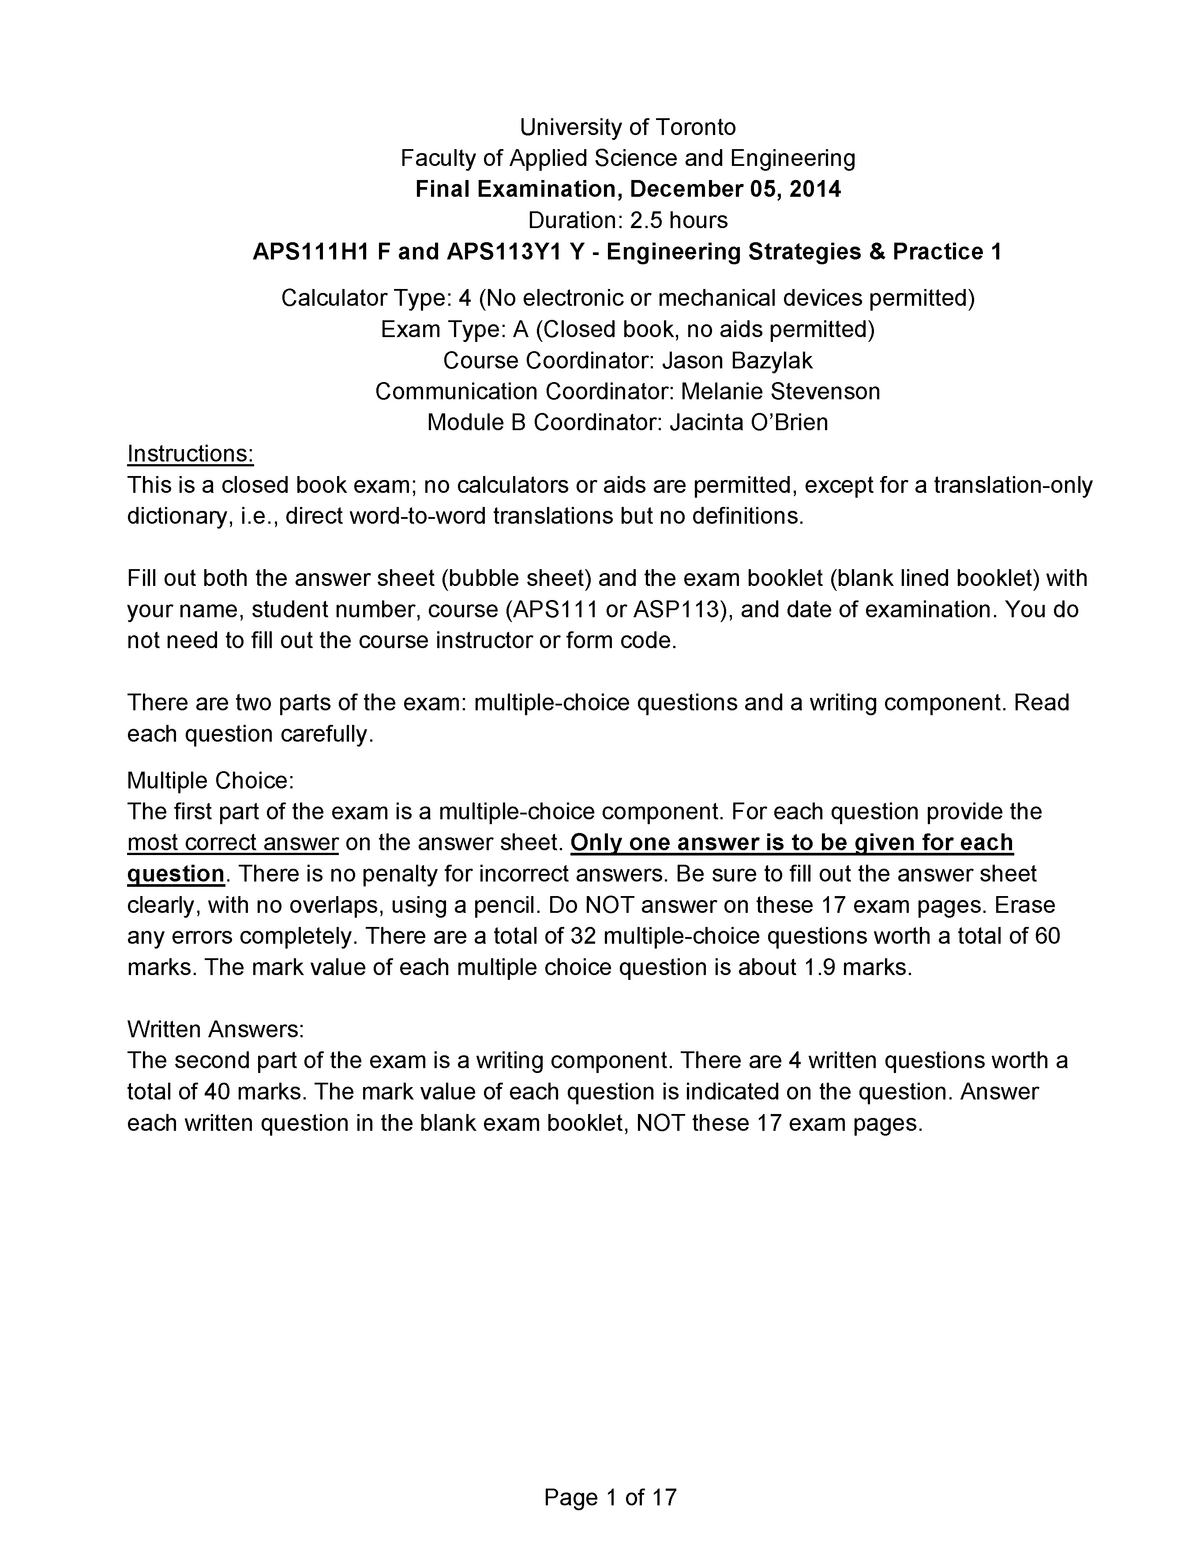 Exam 2014 - APS111H1: Engineering Strategies and Practice I